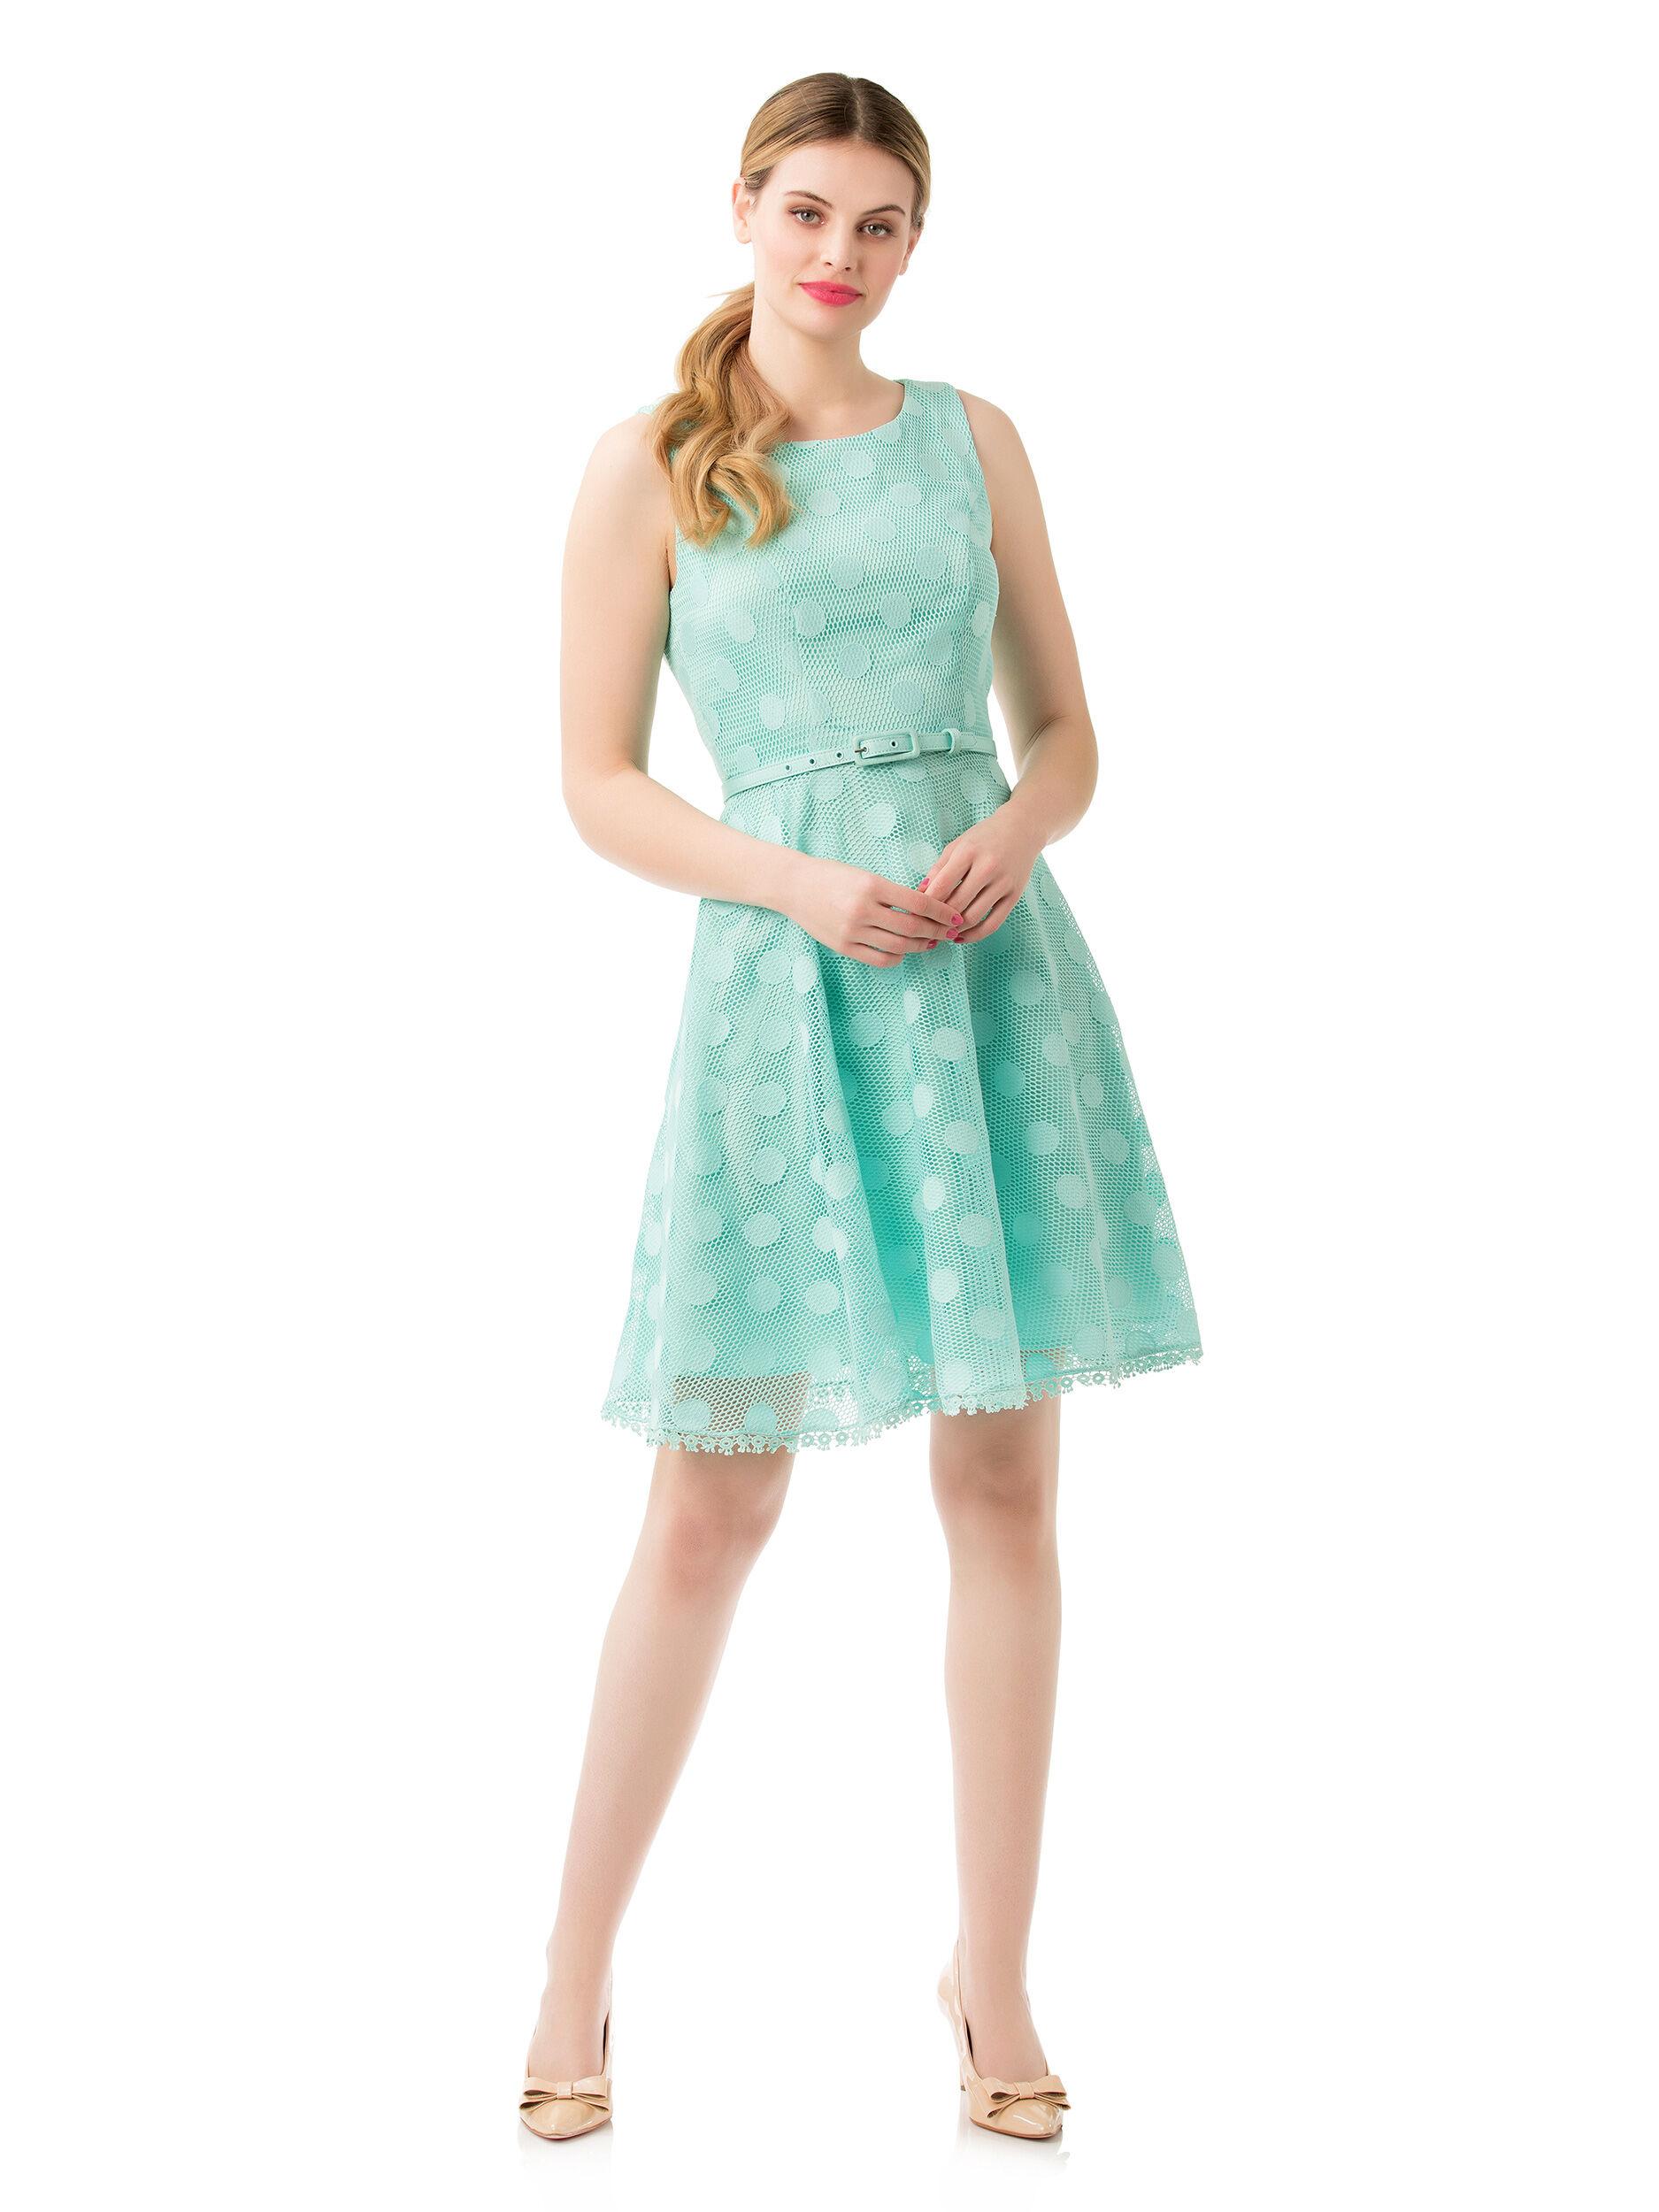 Whole Lotta Love Dress